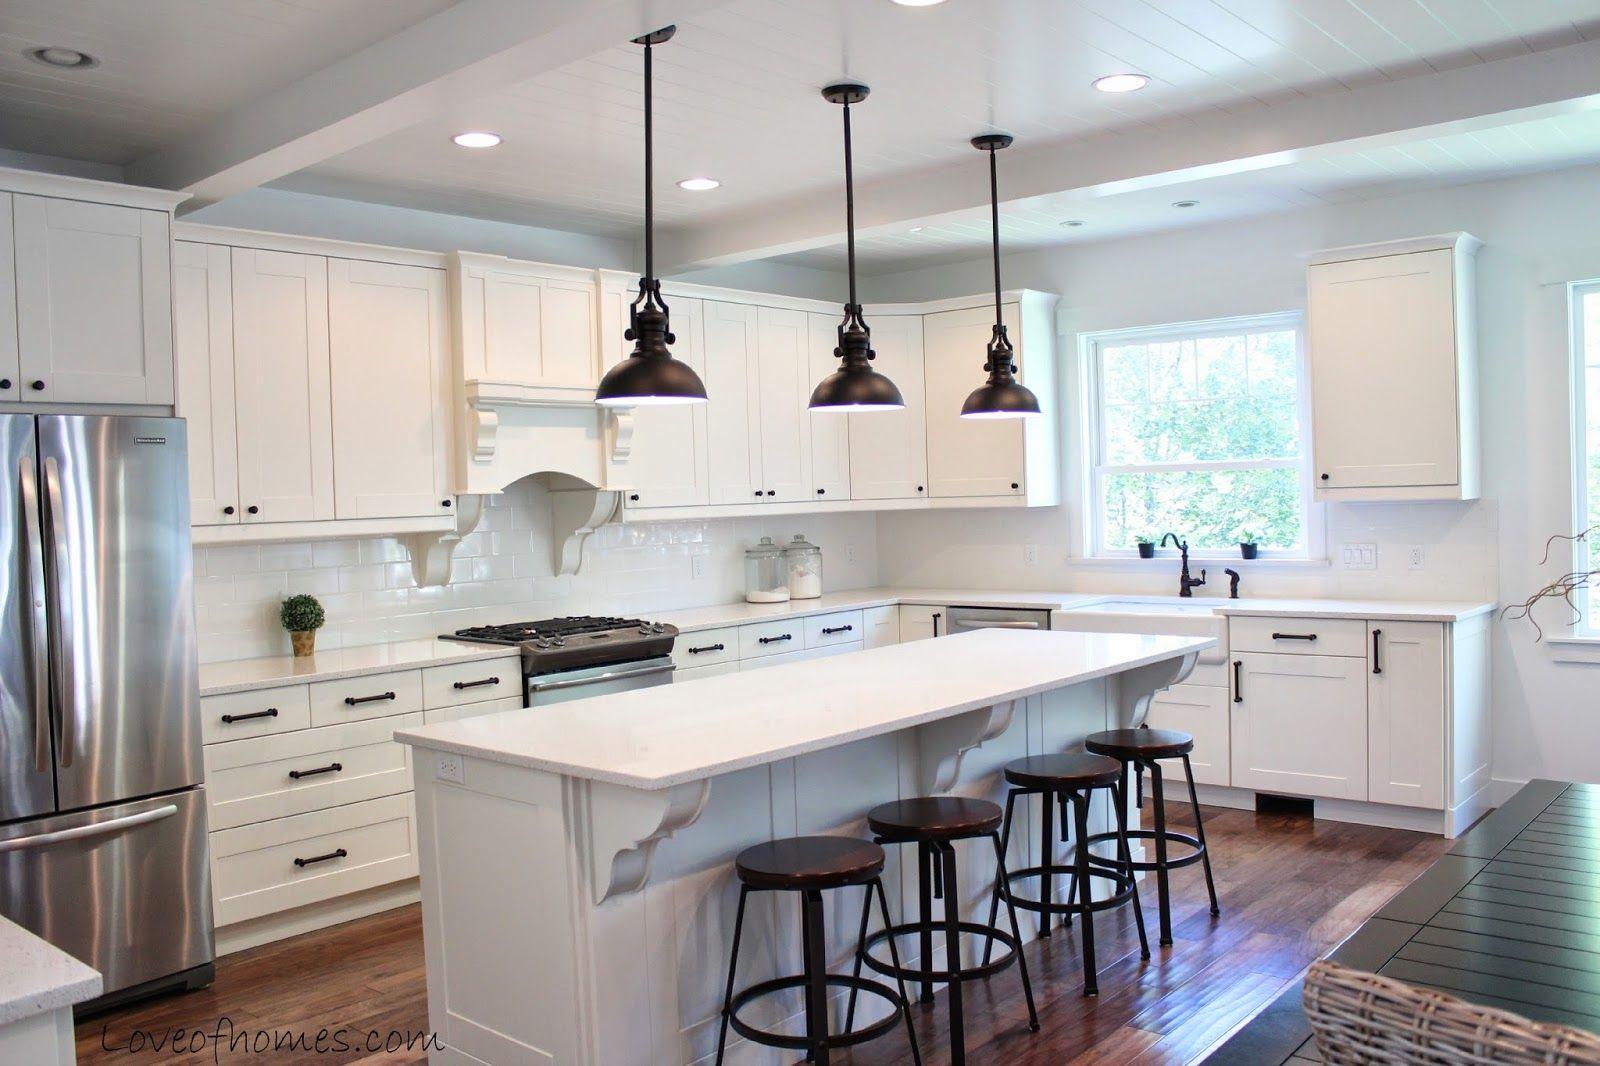 The Ikea Kitchen Remodeling Blog  New Sektion Kitchen Cabinet Mesmerizing Ikea Kitchen Remodel Design Inspiration